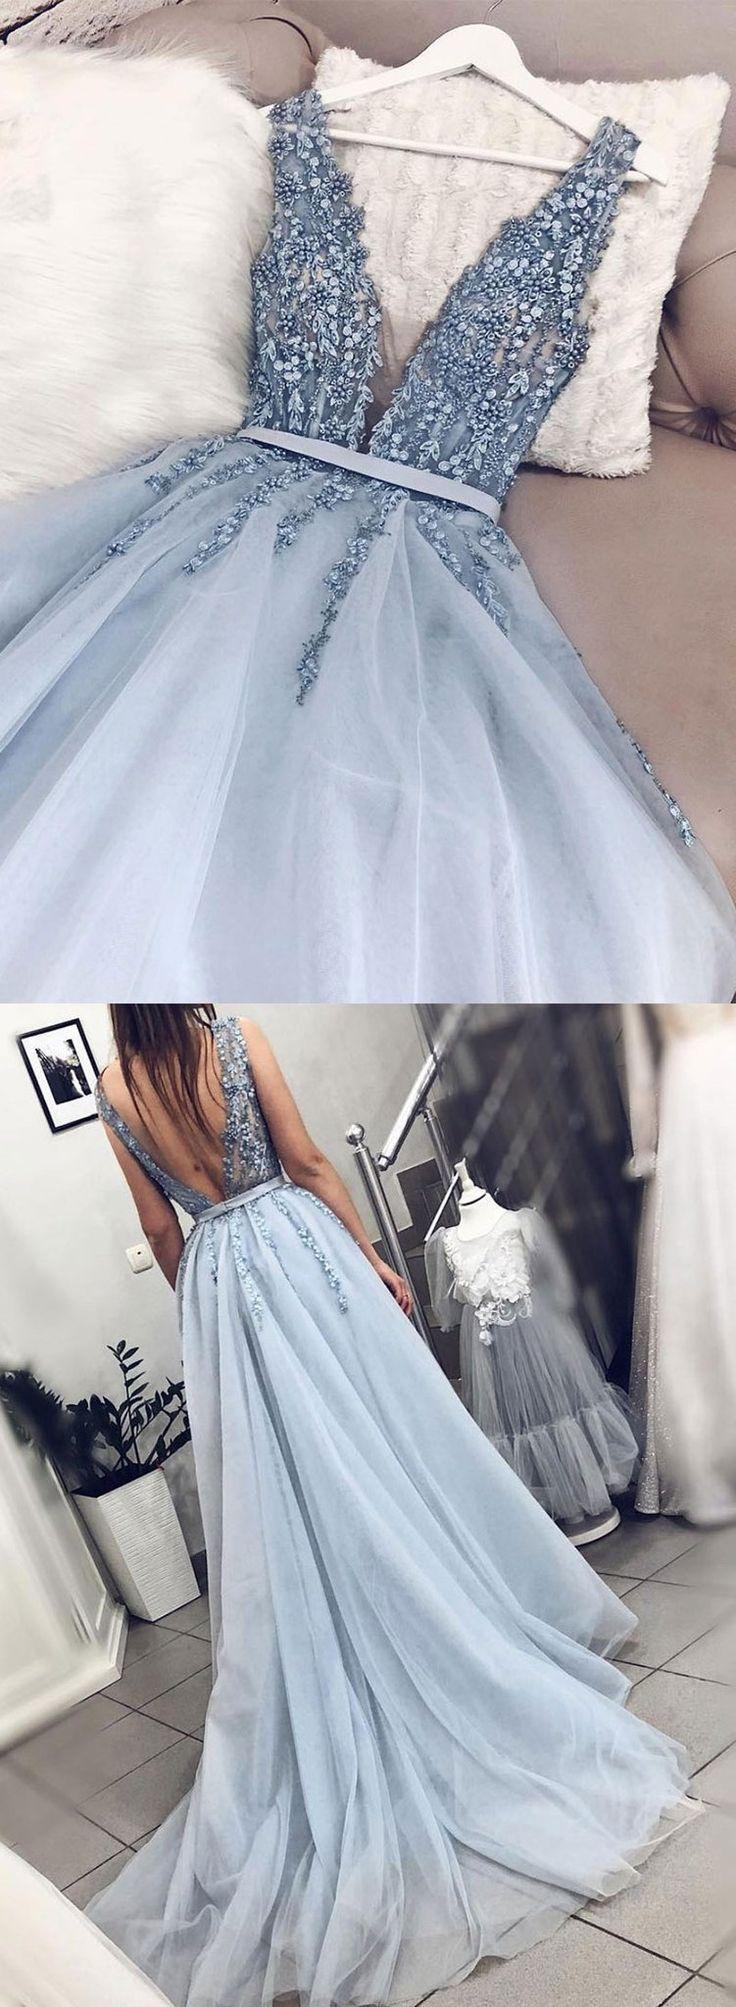 Blue v neck tulle beads long prom dress, evening dress